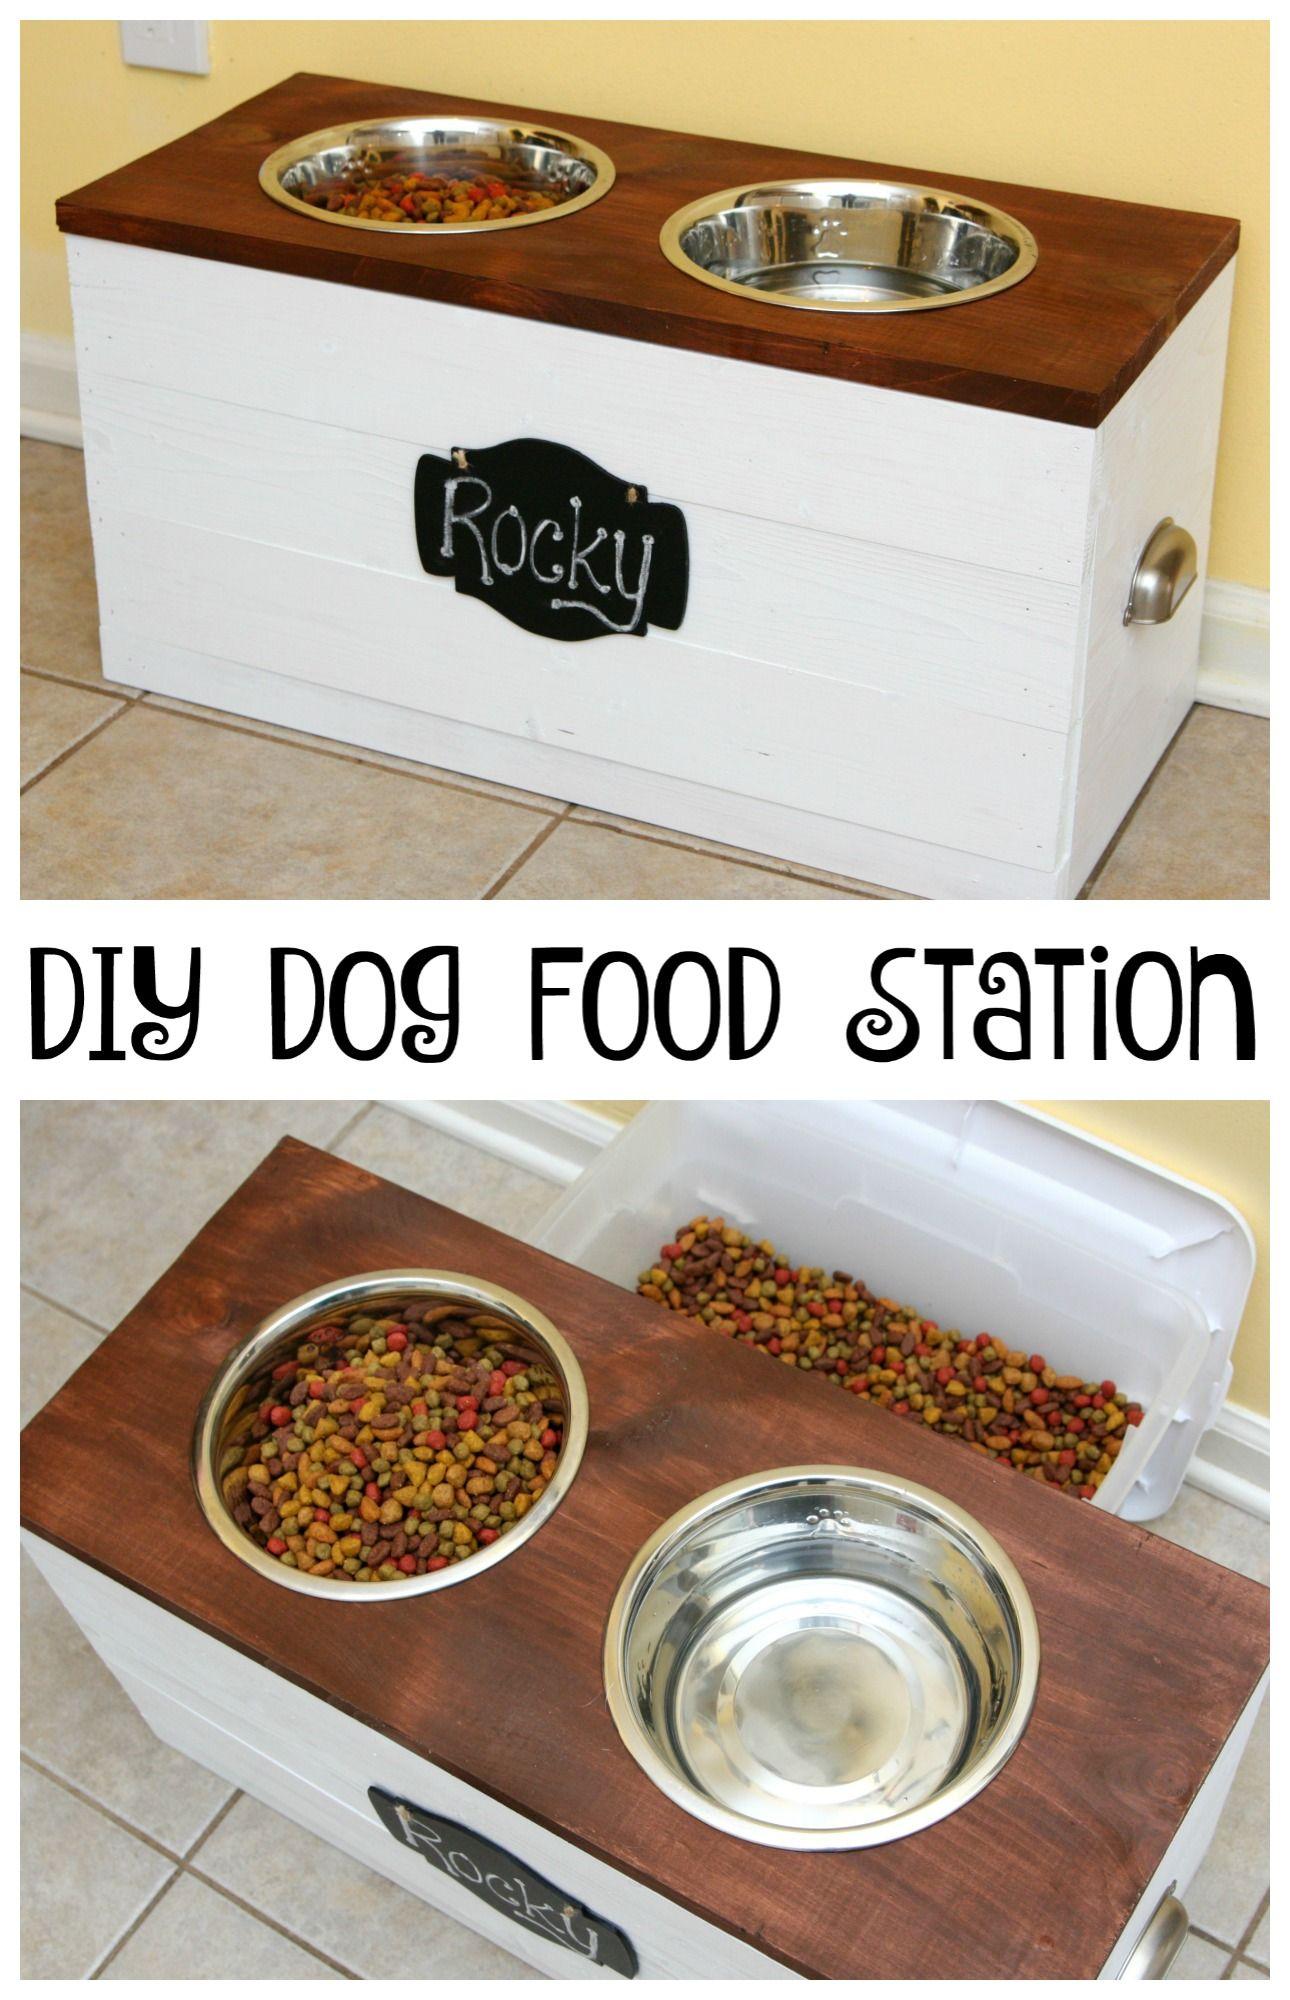 Dog Food Station | Food stations, Dog food and Storage